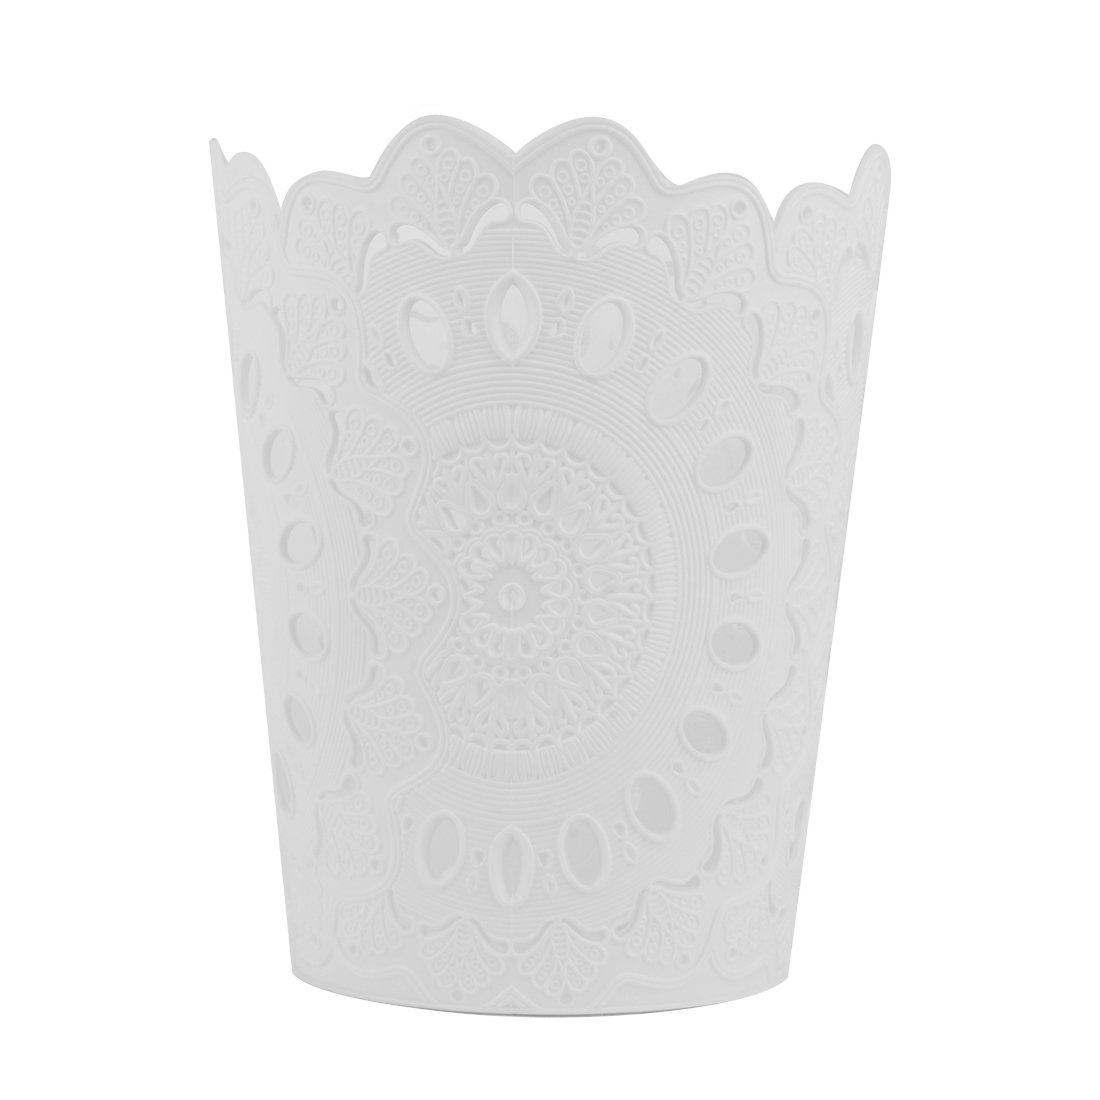 FOKOM Waste Paper Basket Paper Bin